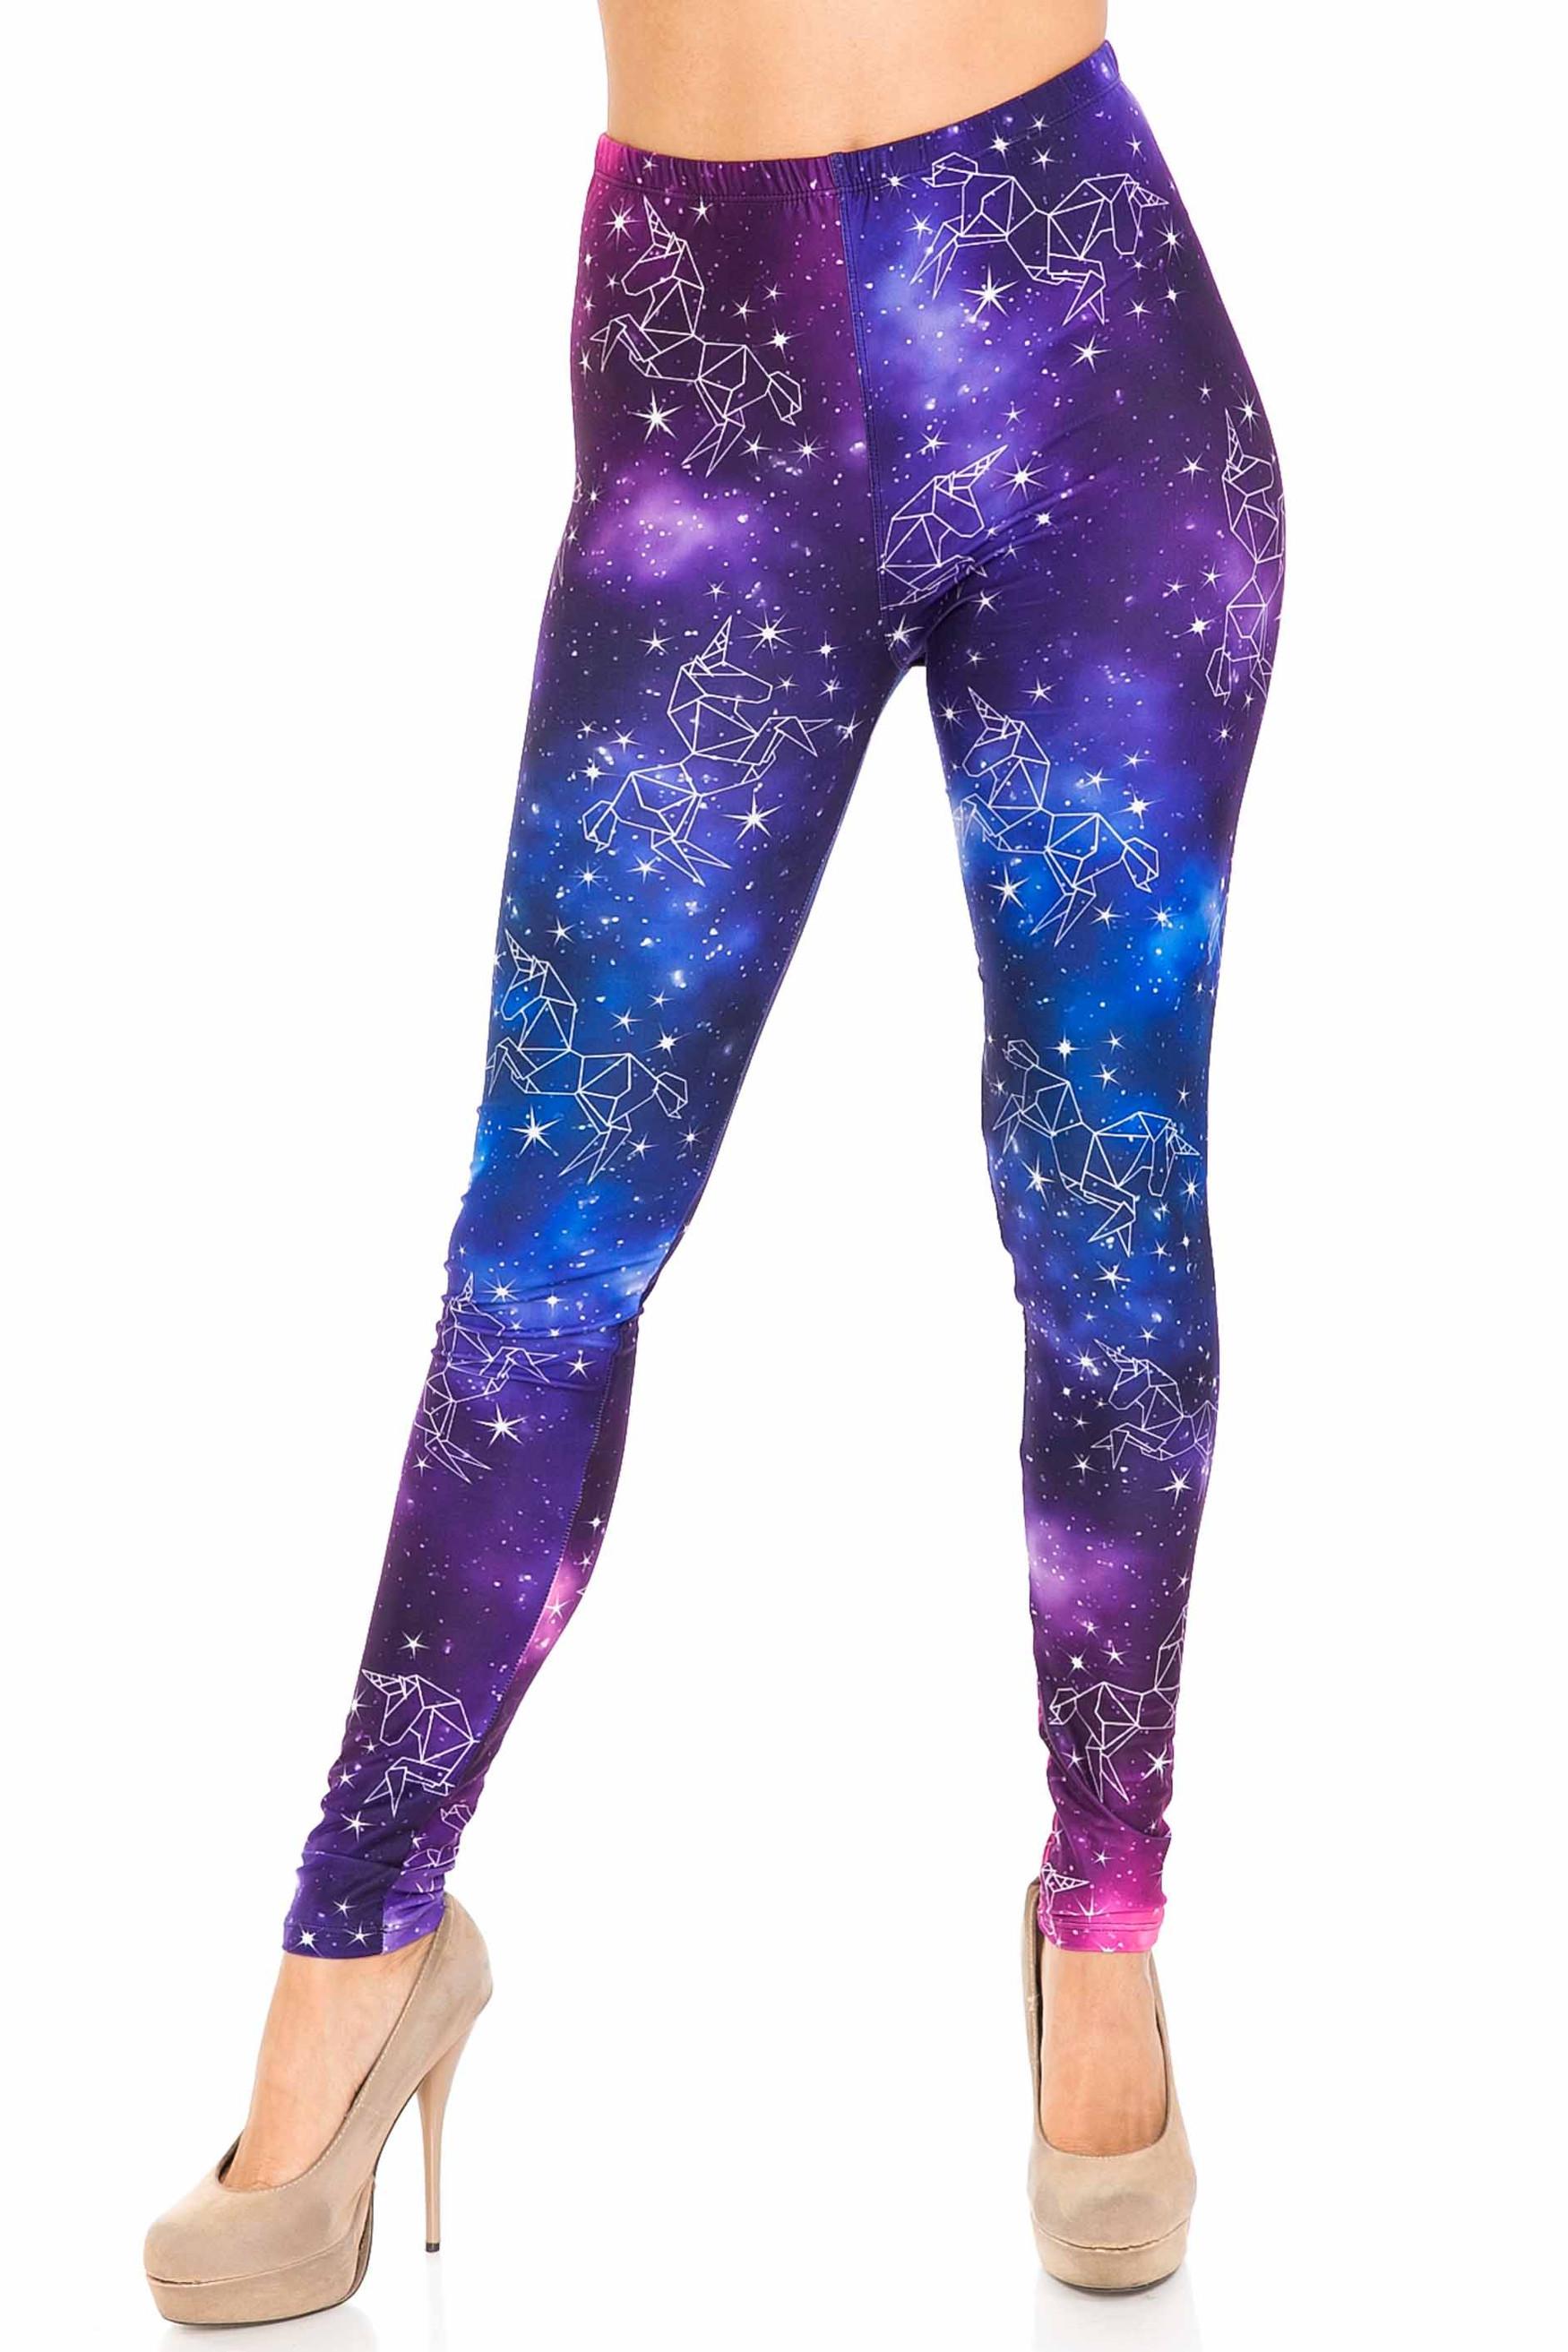 Creamy Soft Unicorn Galaxy Leggings - USA Fashion™